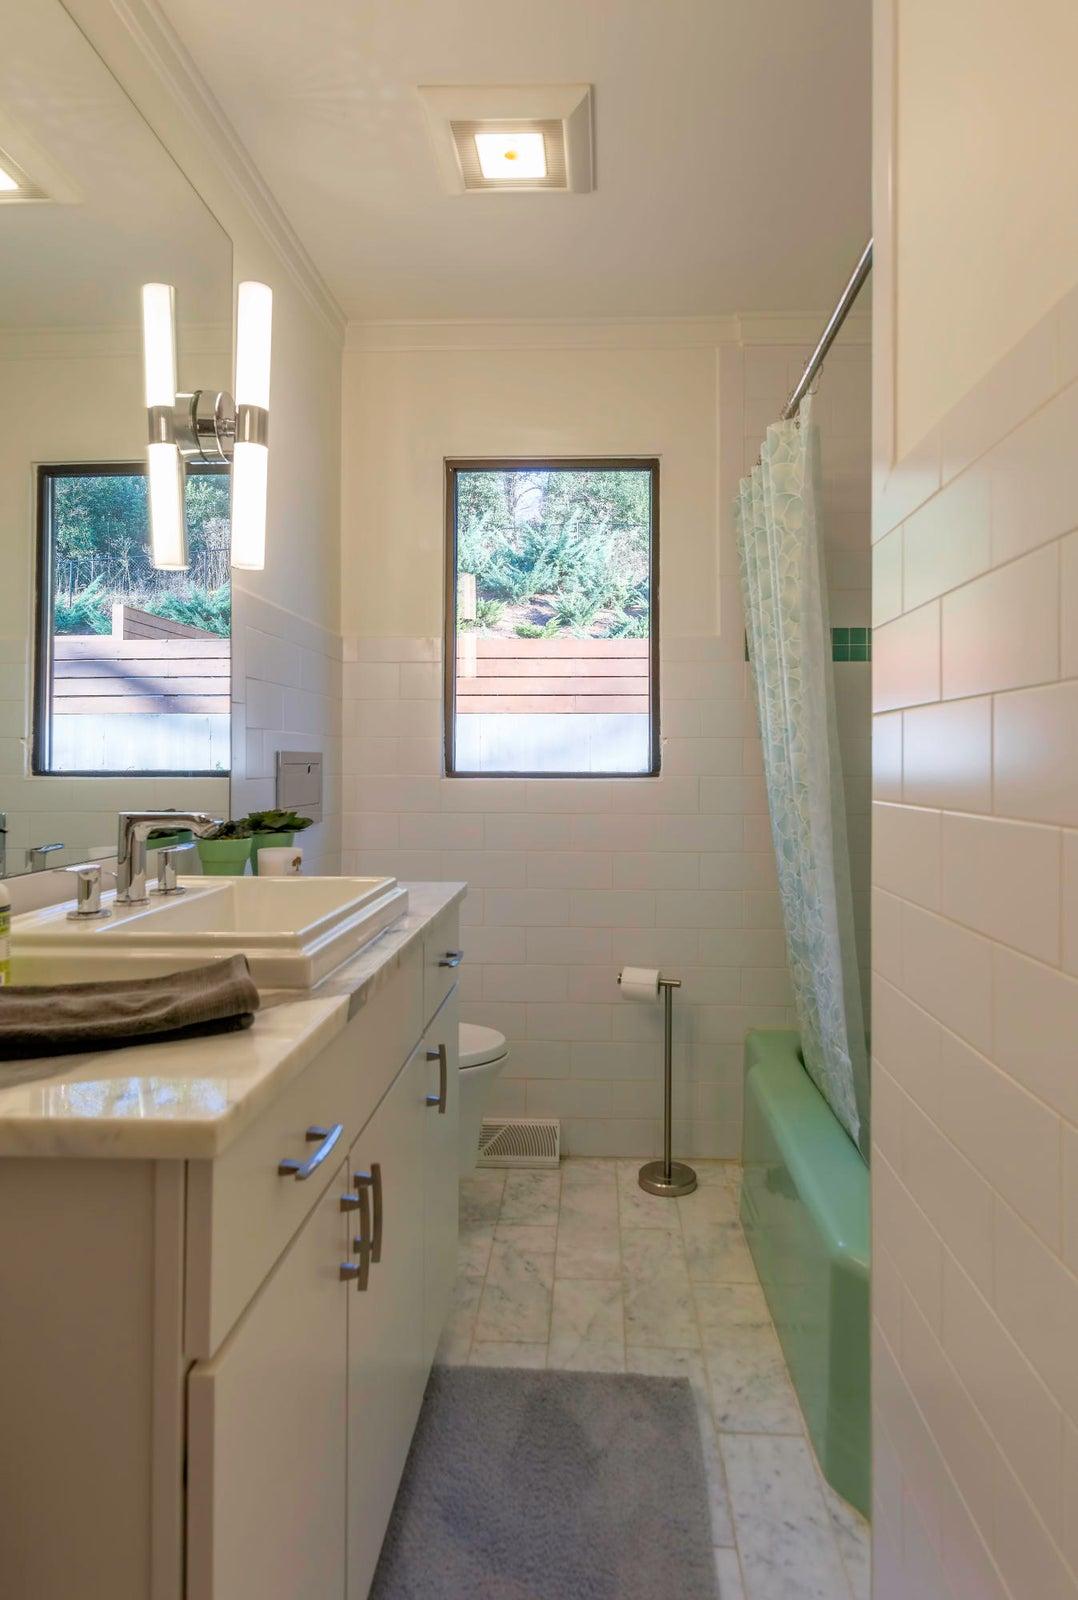 DSC_2052 - Bathroom 1